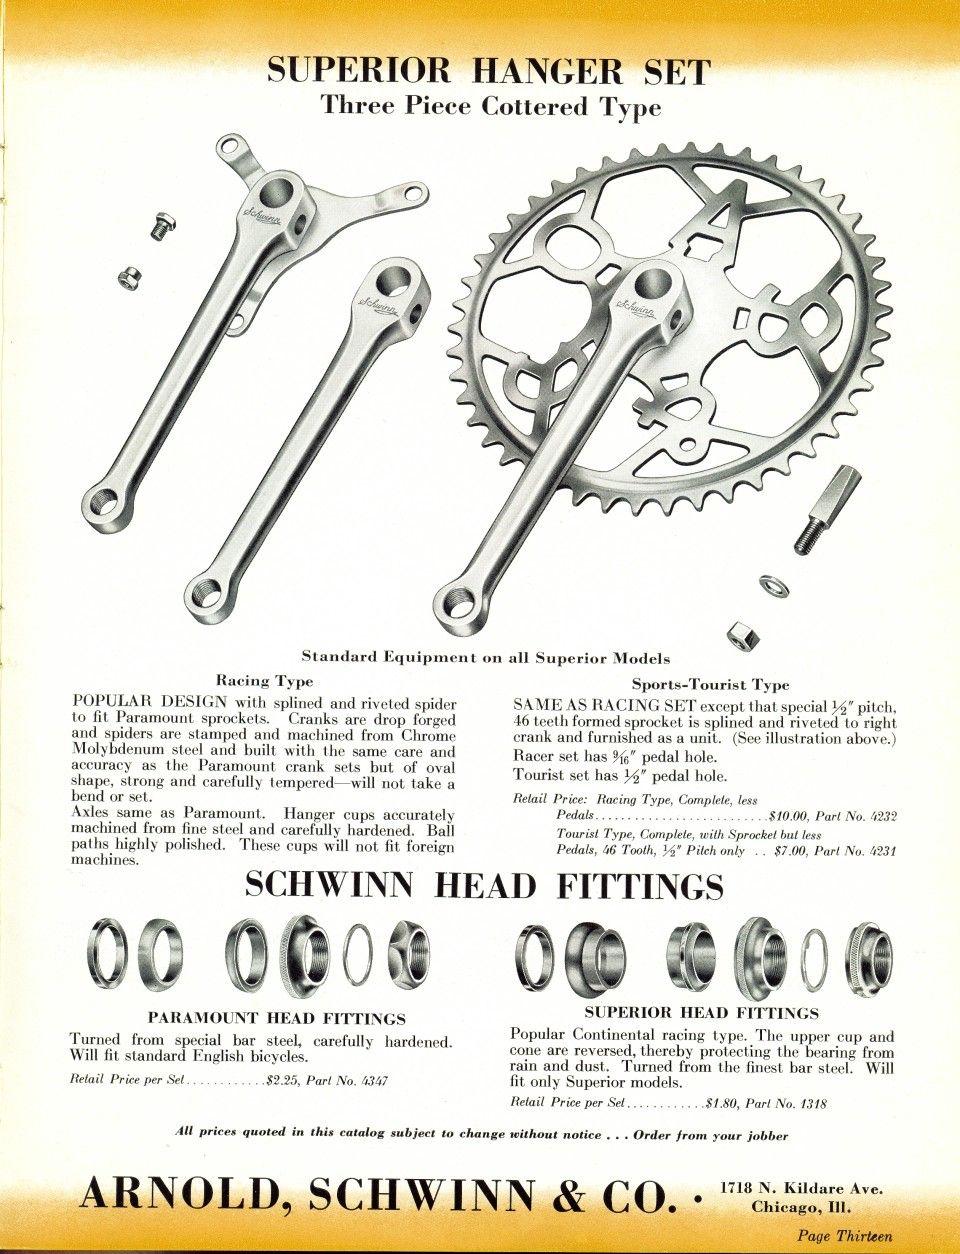 Schwinn Cranks And Headsets 1939